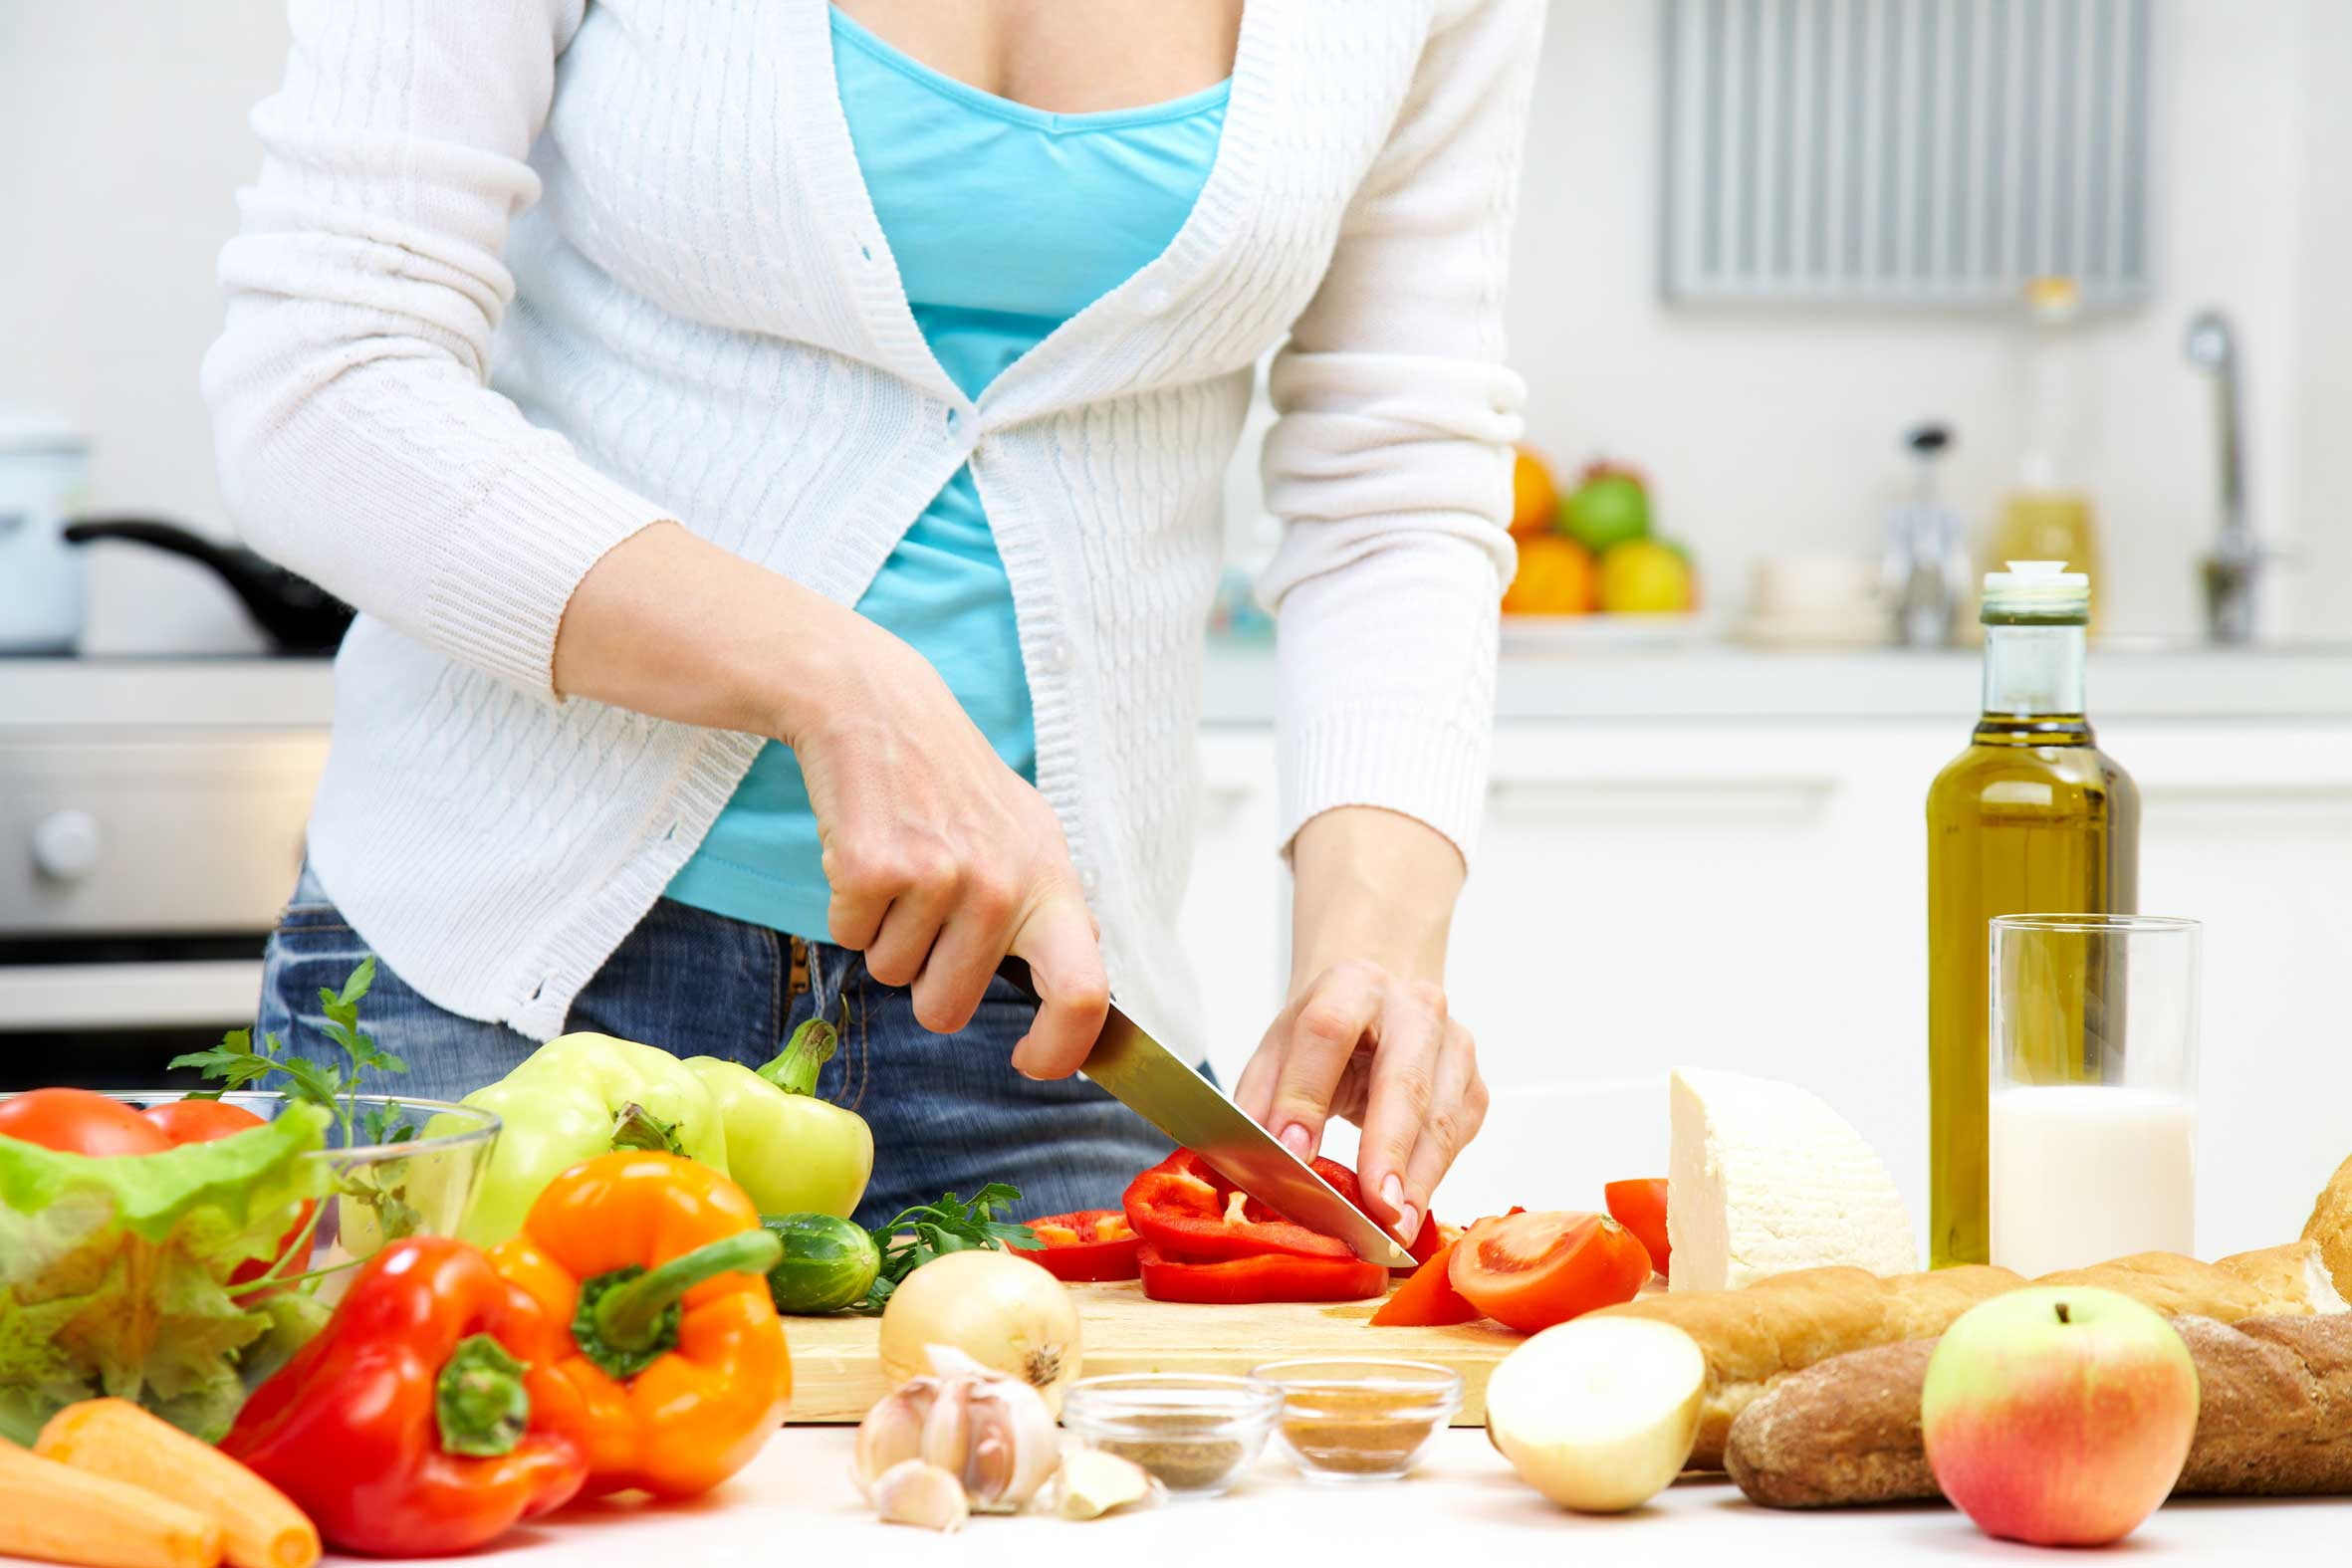 Alimentos para aumentar la fertilidad masculina